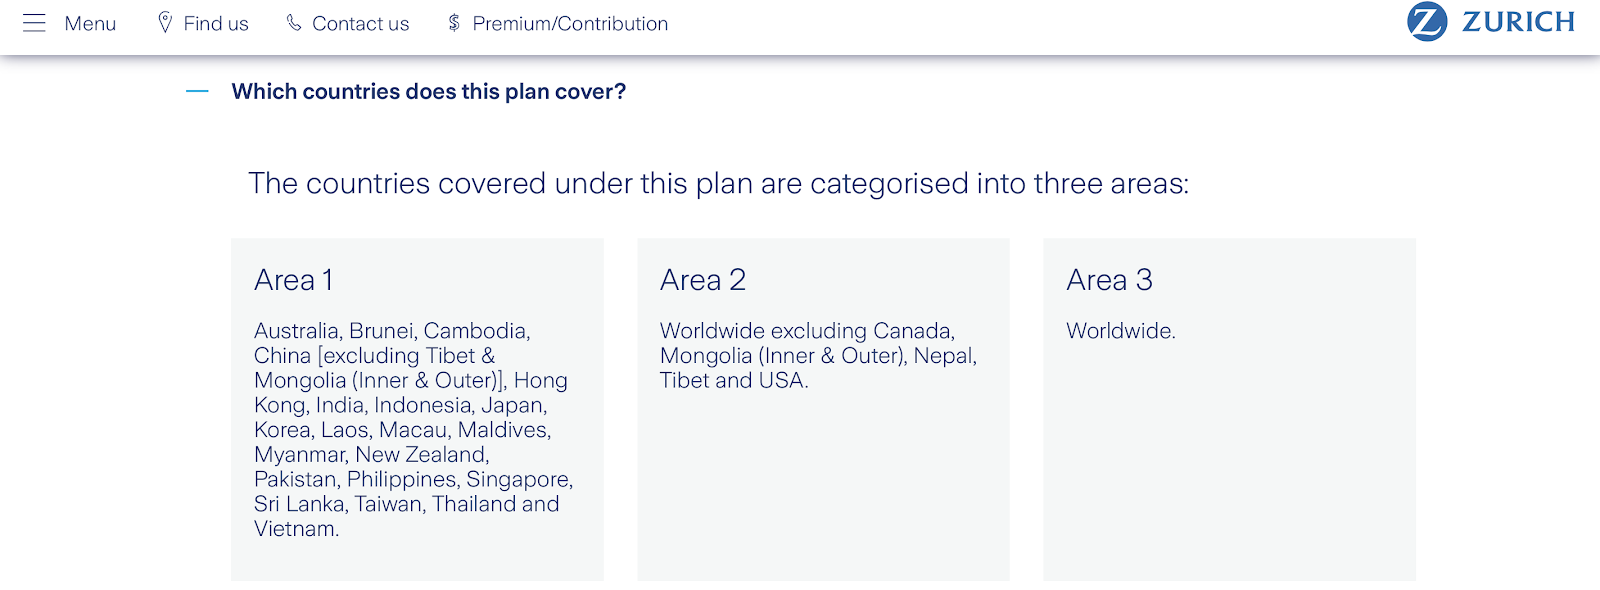 Zurich Travel Insurance Malaysia